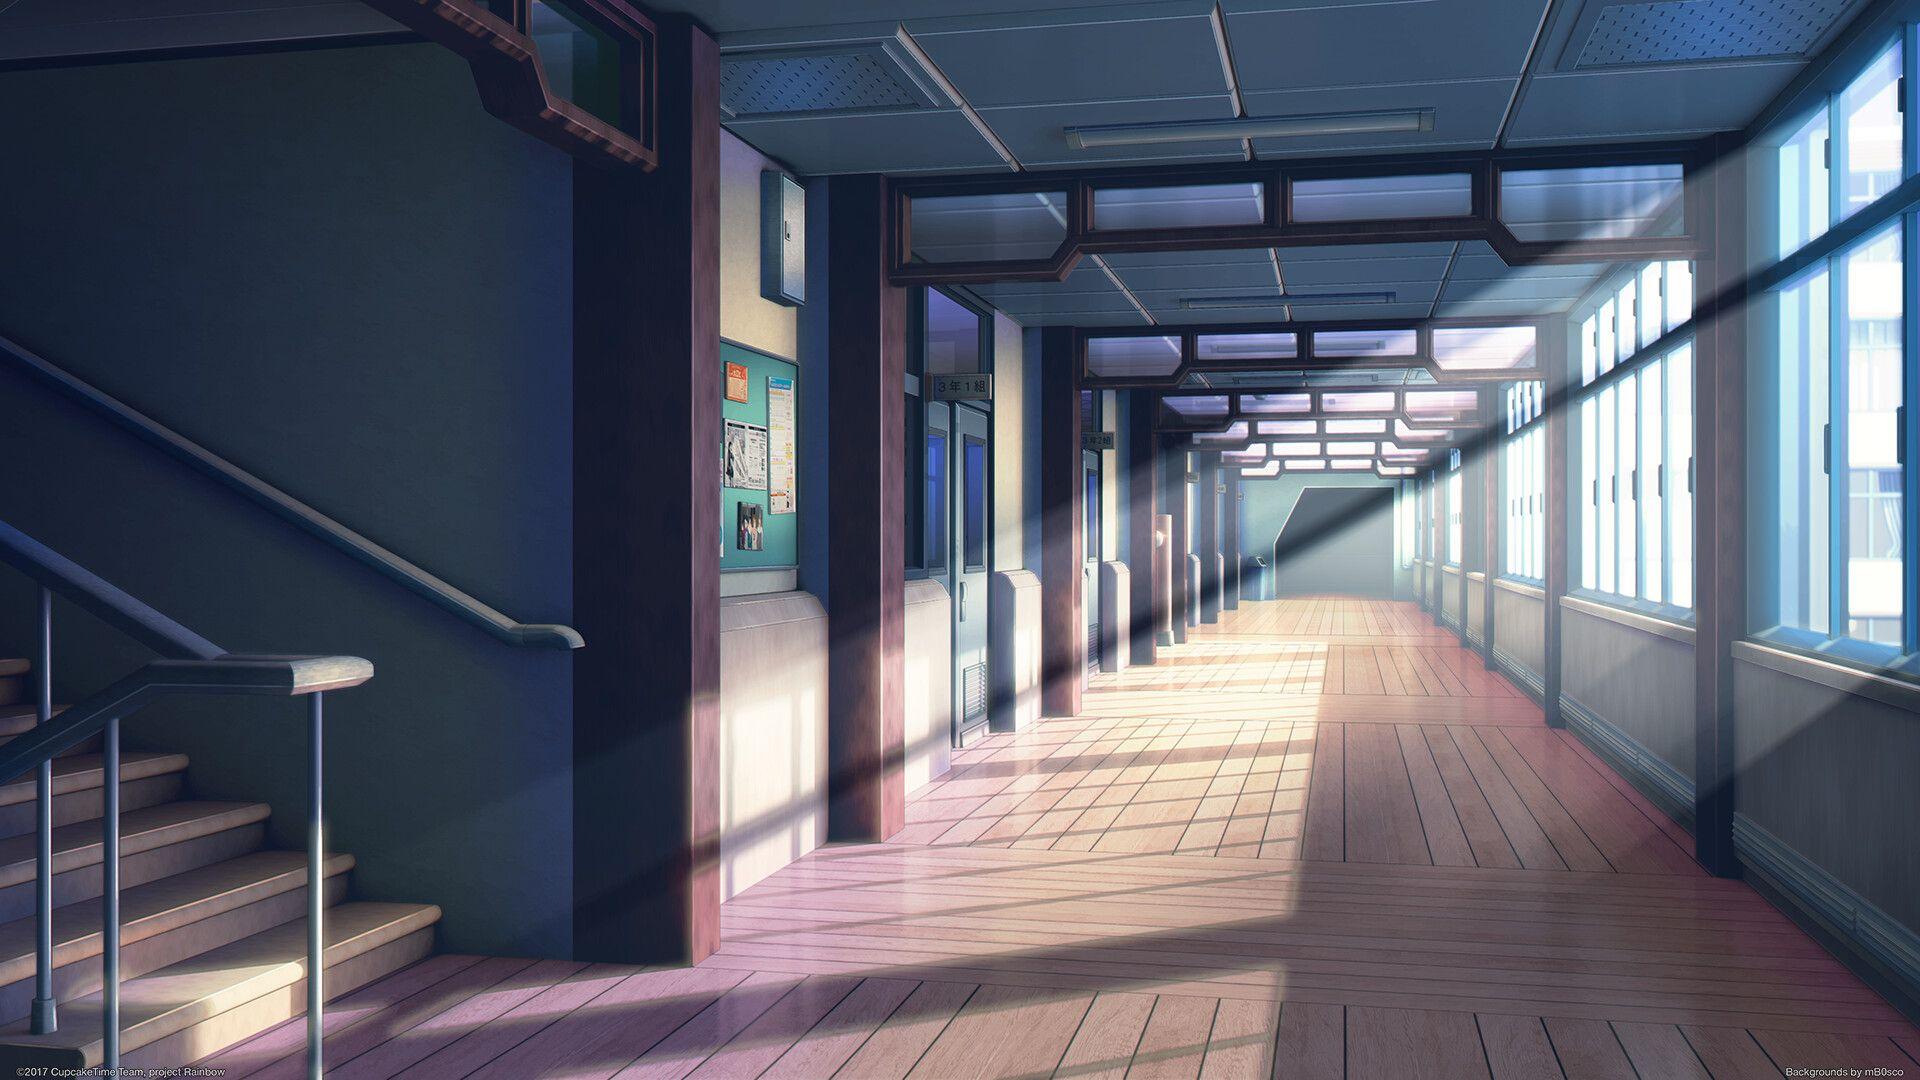 Artstation Second Floor Bogdan Mb0sco Cenario Anime Fundo De Animacao Fundo Para Video